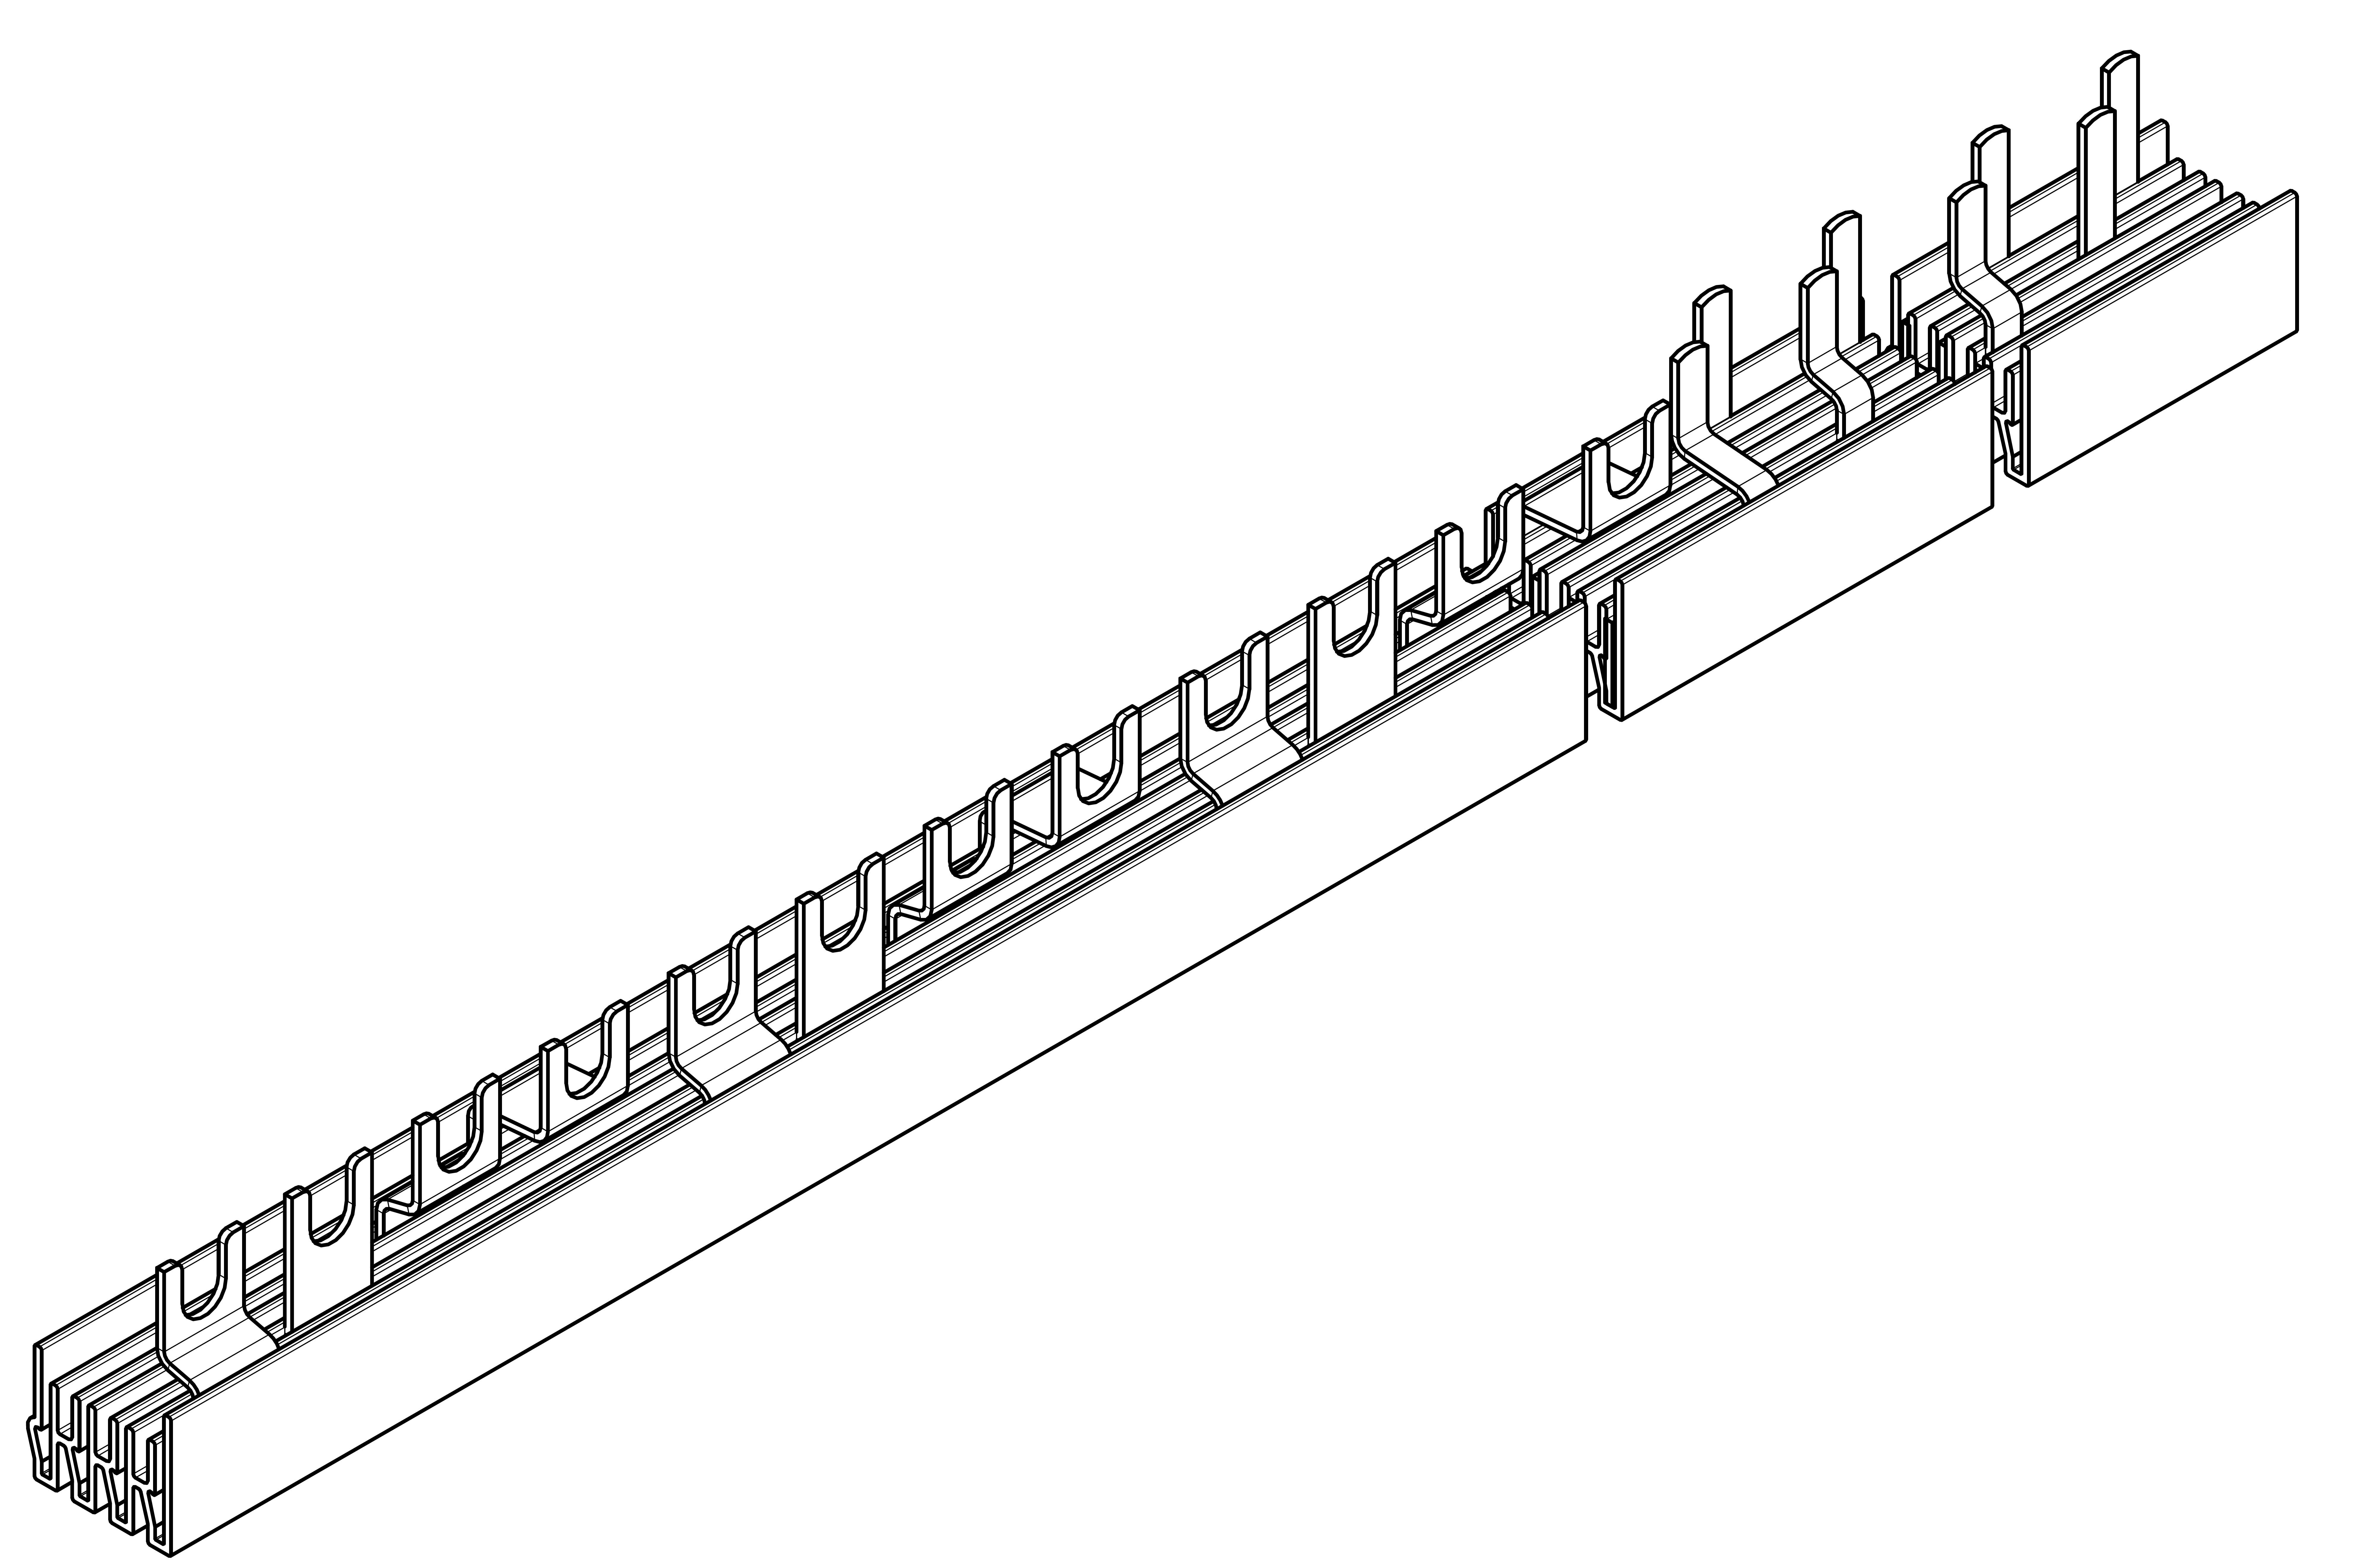 1 Stk Verschienung Compact 4 x FI 4-polig,12 x LS 1+N auf 1TE BS990163--